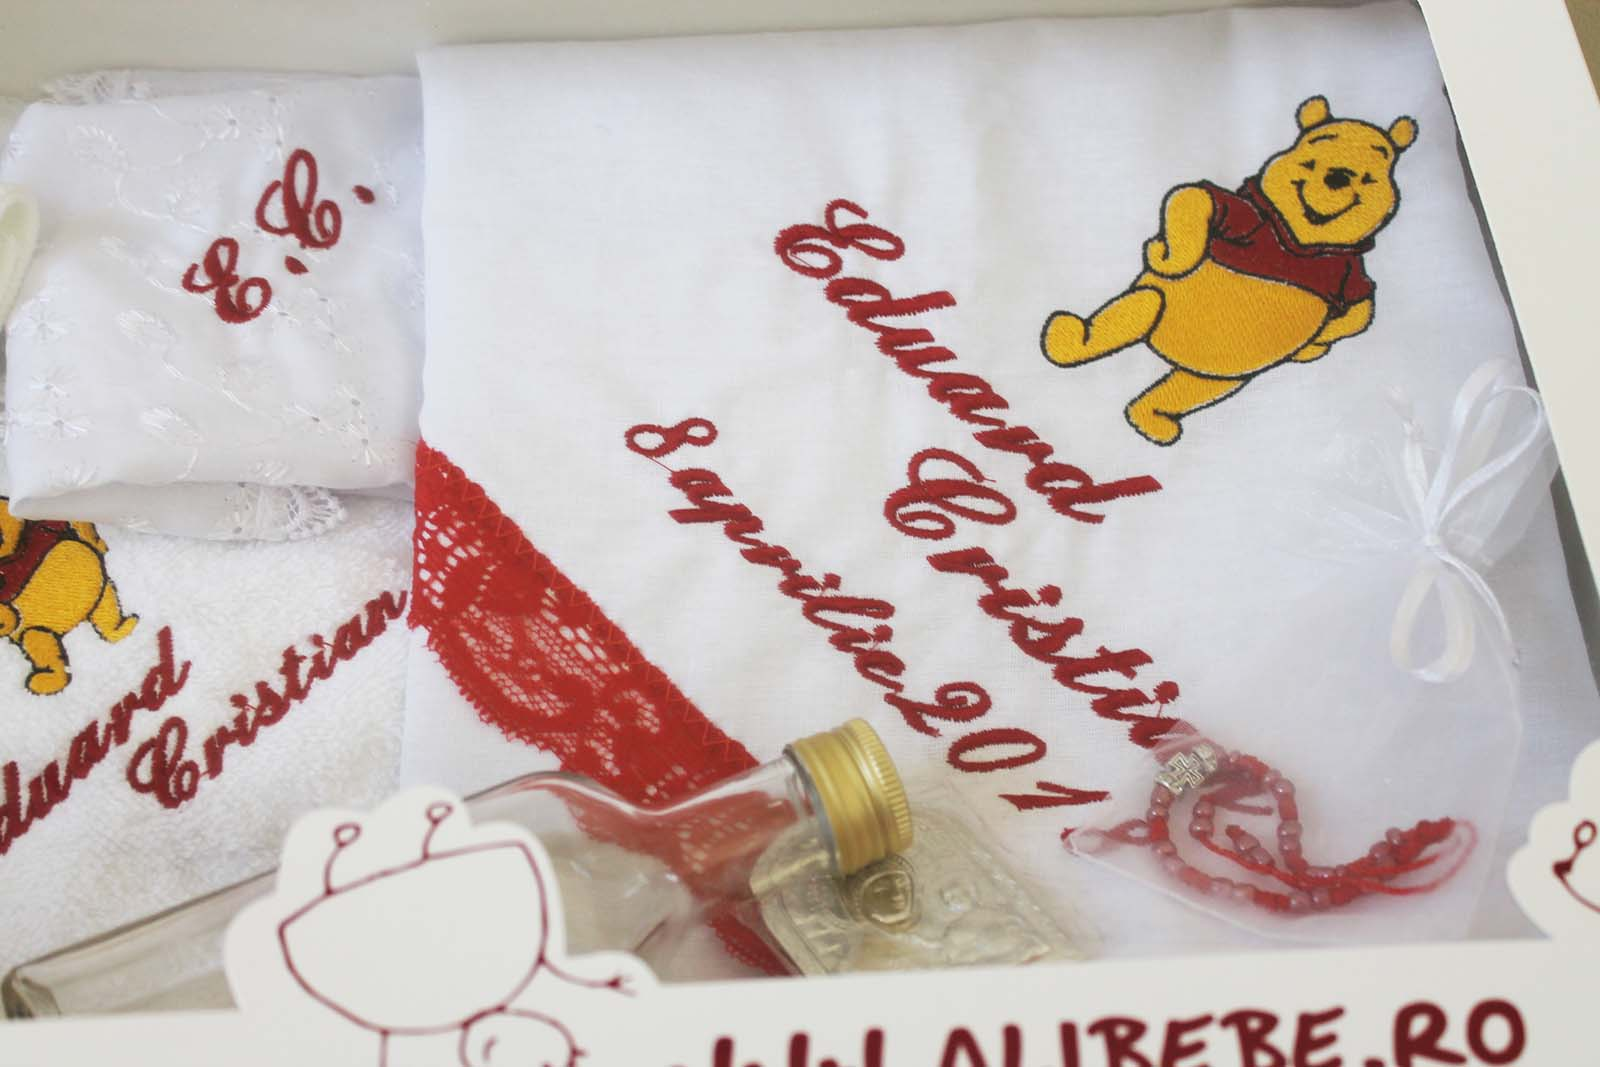 Botez Tematic Winnie The Pooh Alibebero